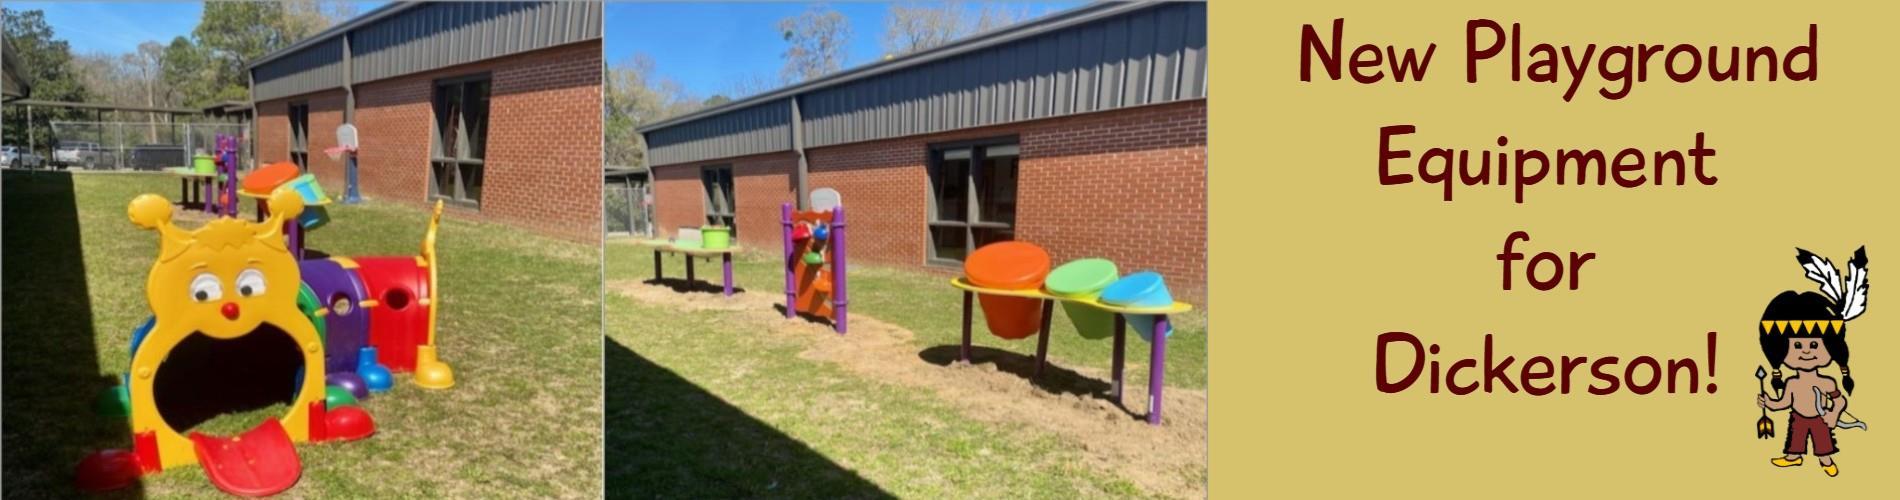 New Playground Equipment for JDD